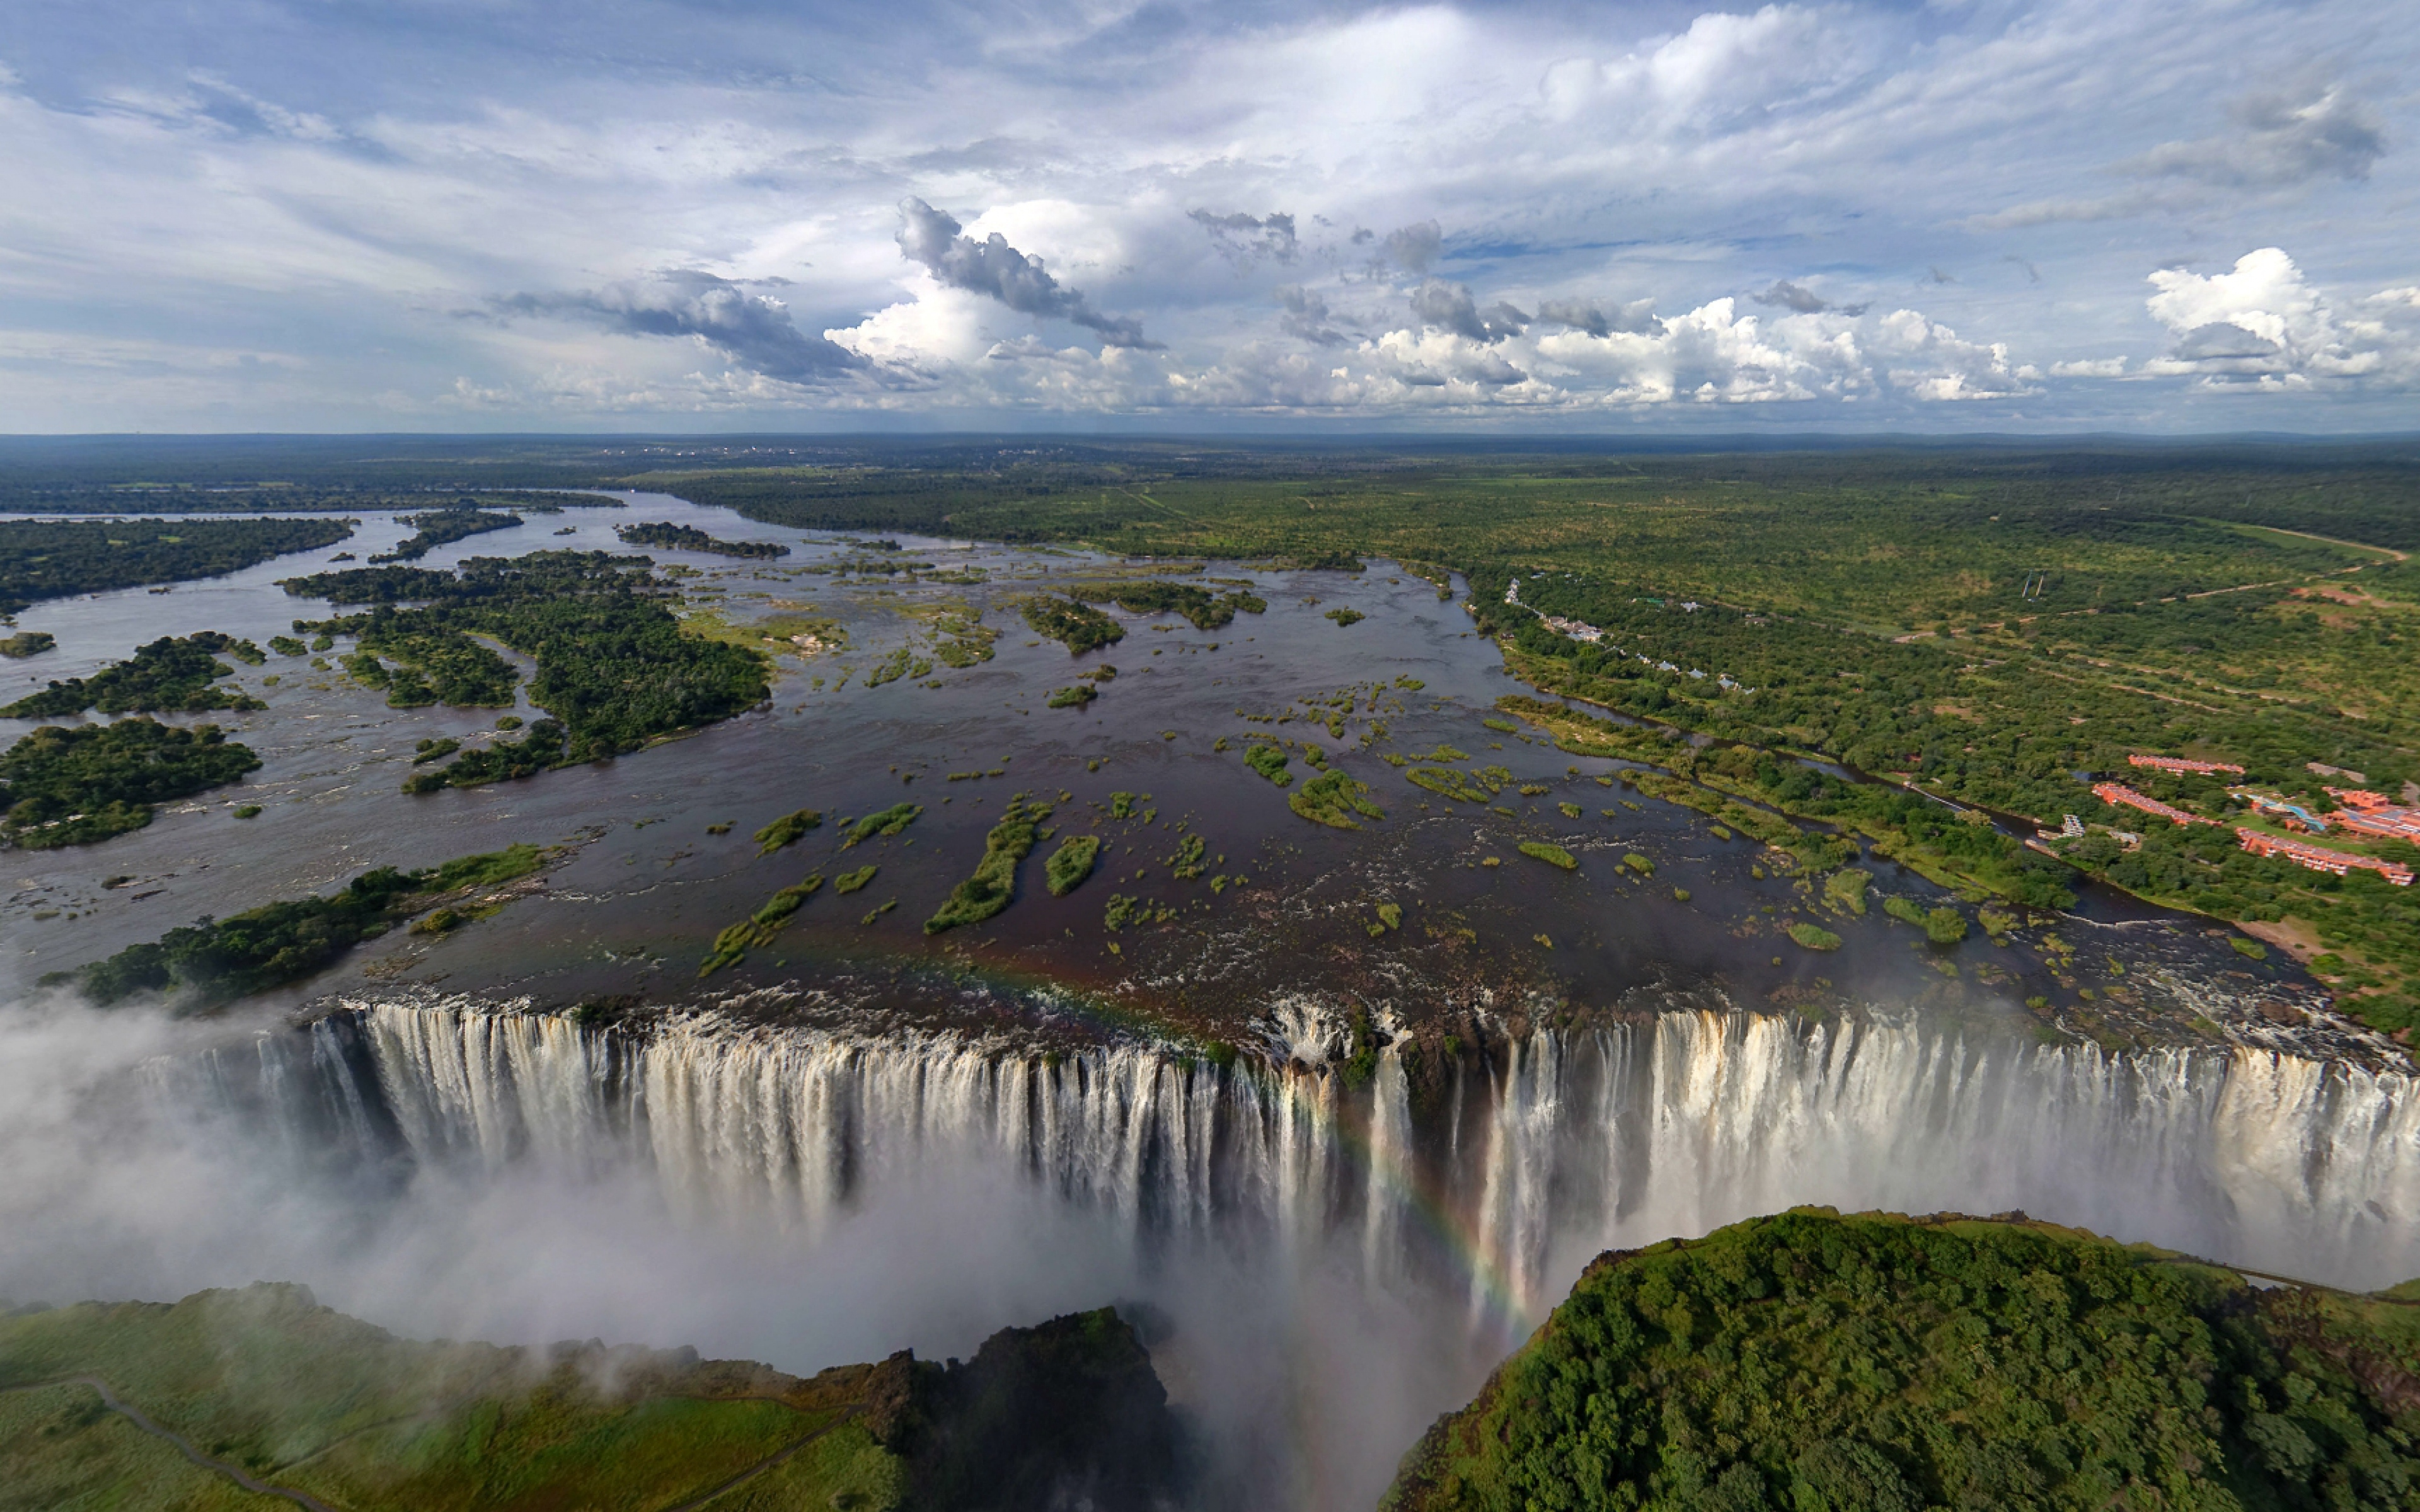 Africa Break Vegetation Rainbow Wallpaper Background Ultra HD 4K 3840x2400